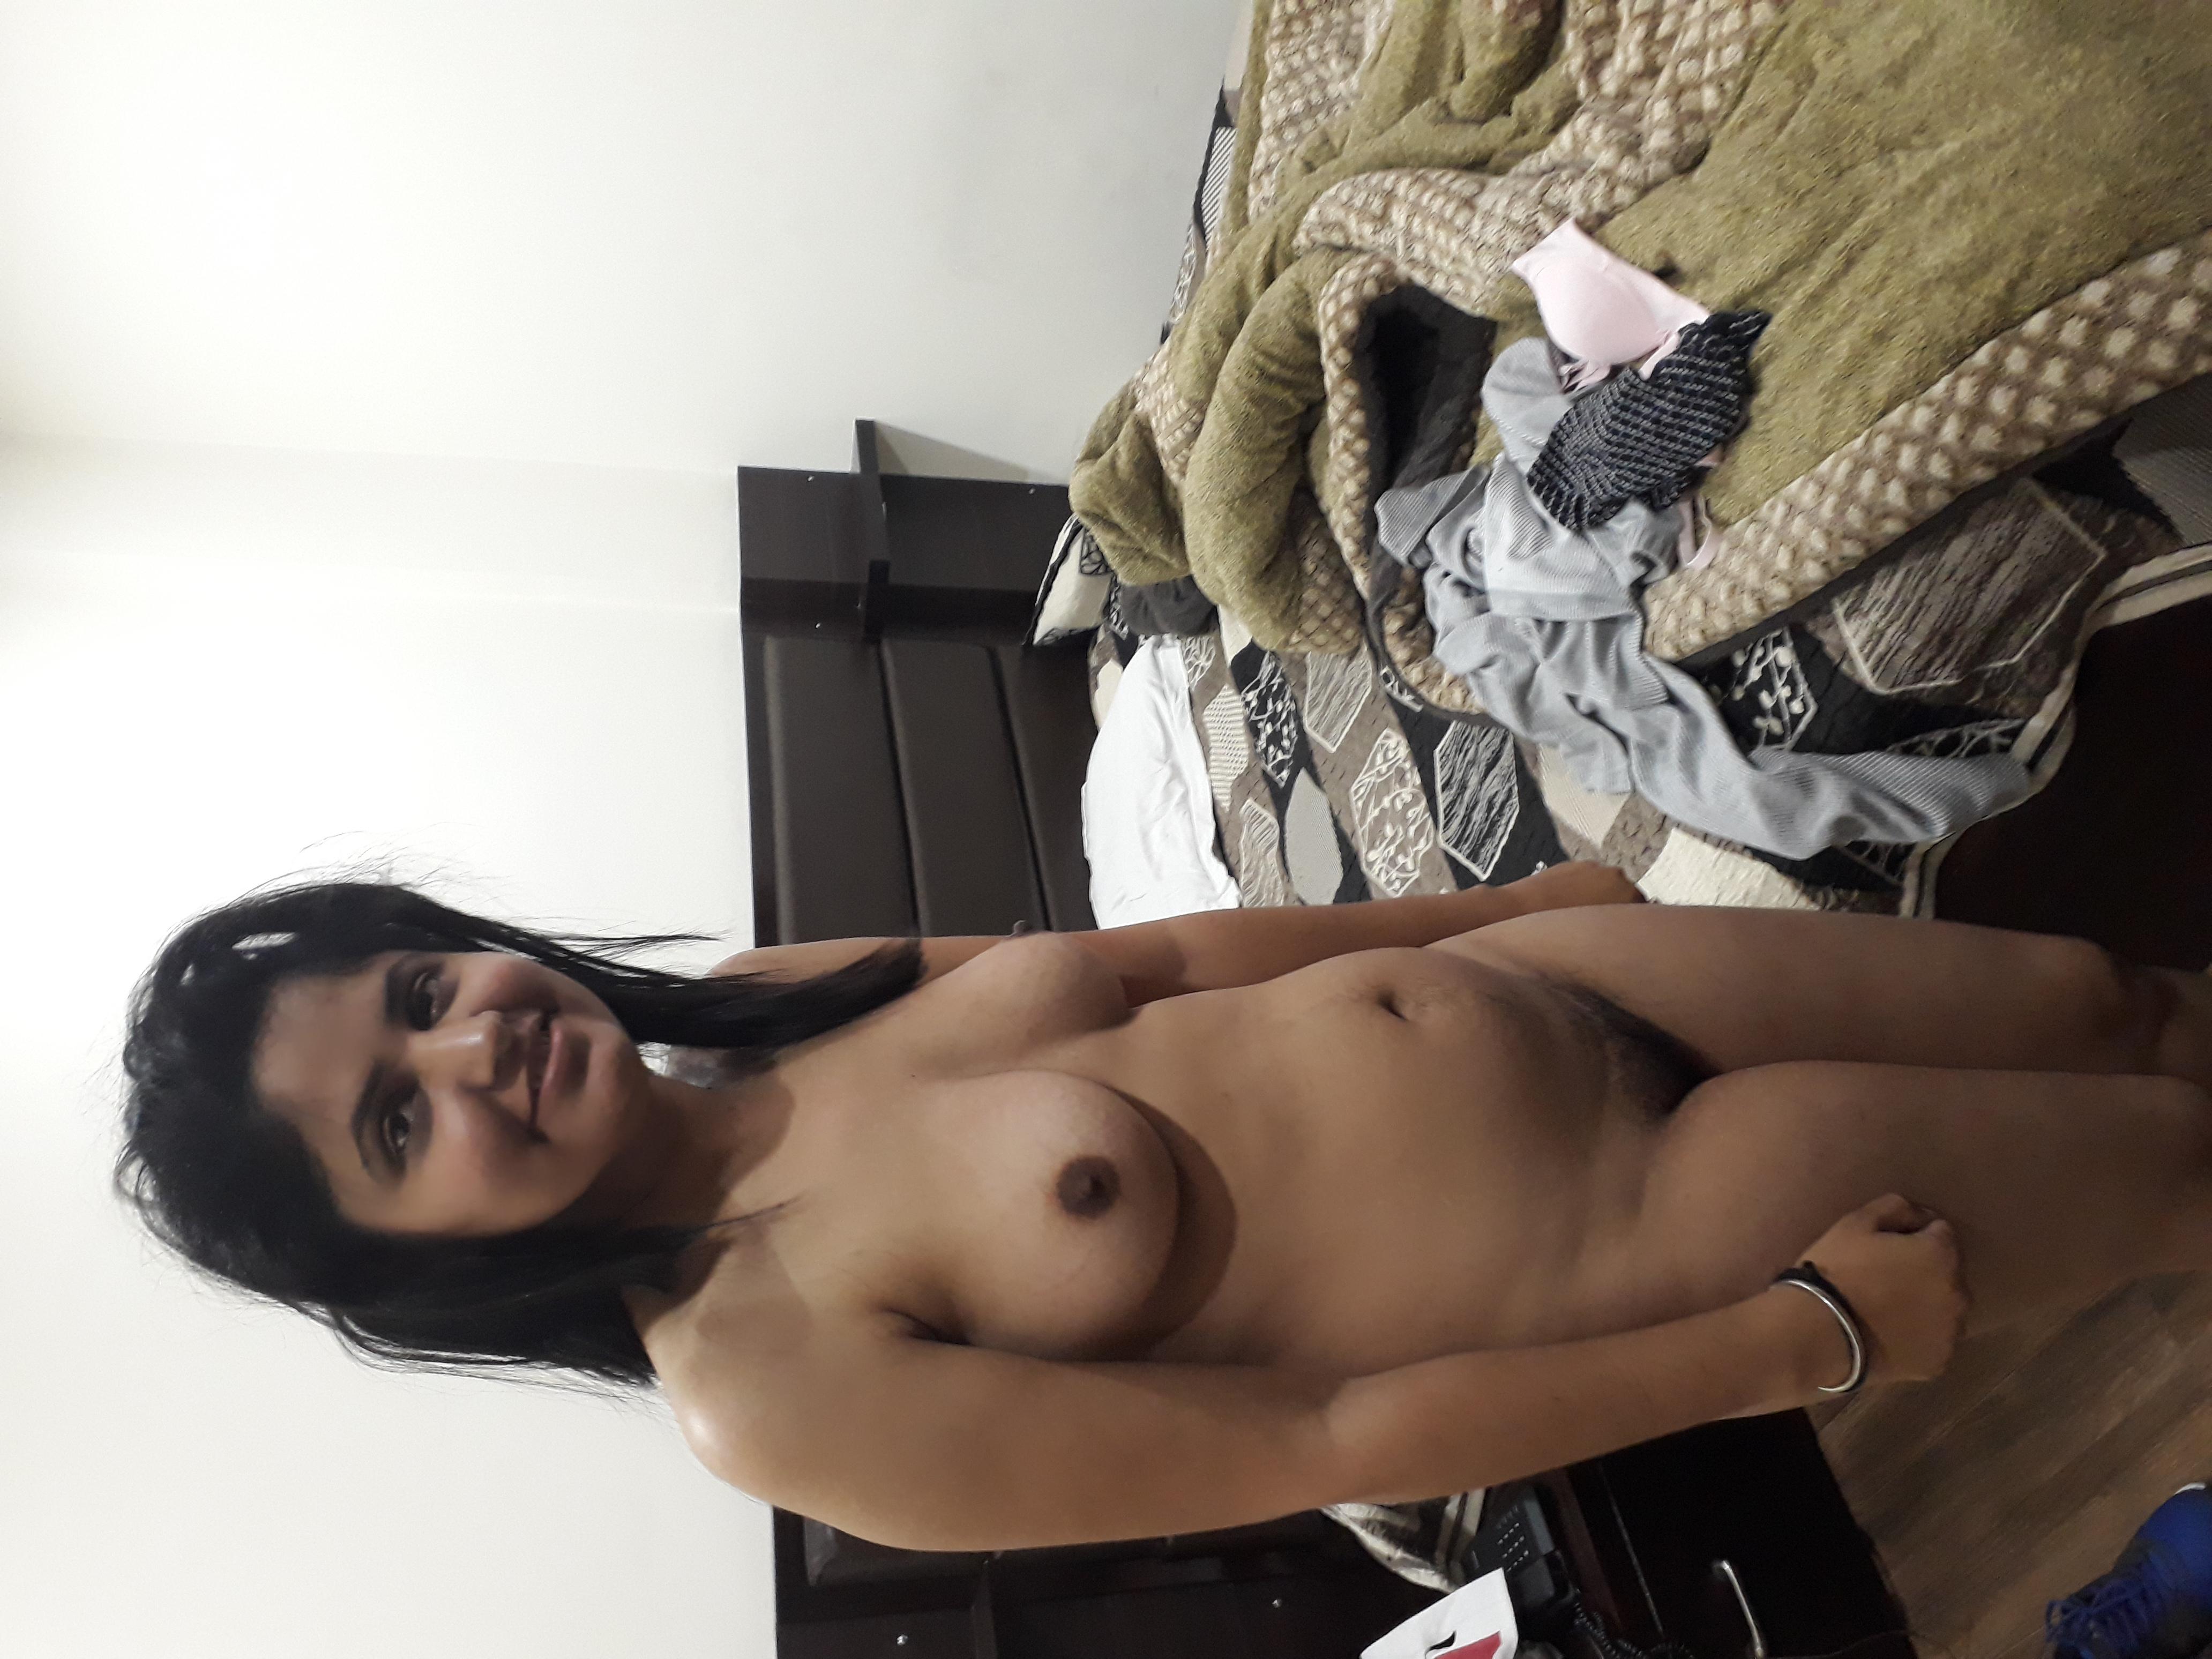 Big tit latina hd